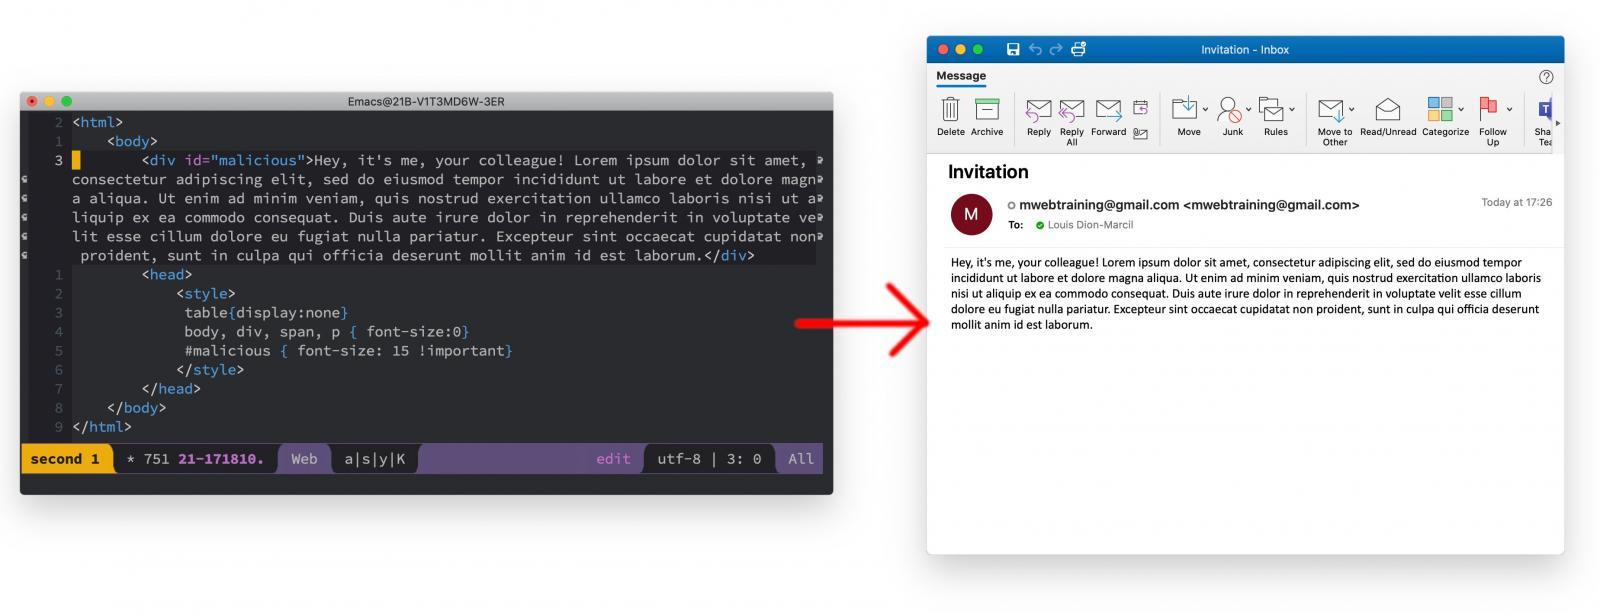 CSS code hides external sender warning